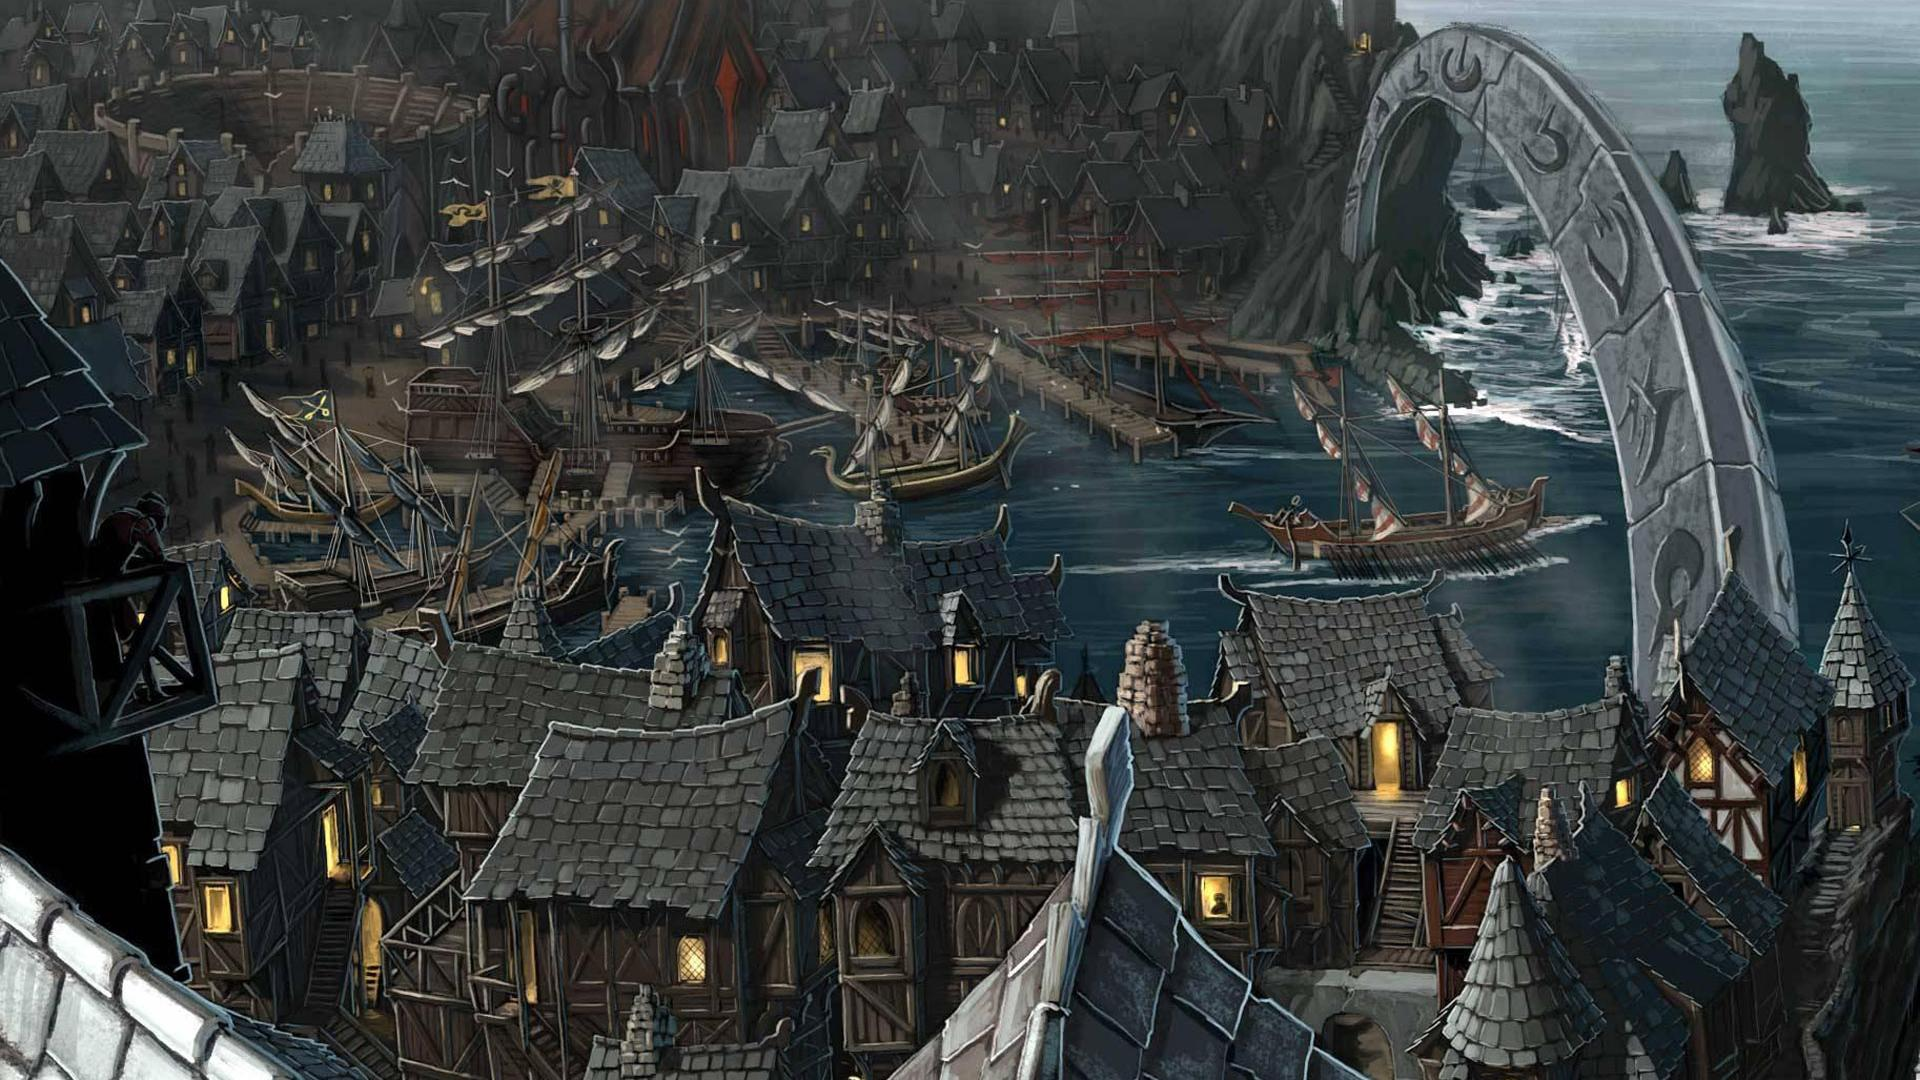 Download Wallpaper Riddleport town in RPG Pathfinder 1920 1920x1080